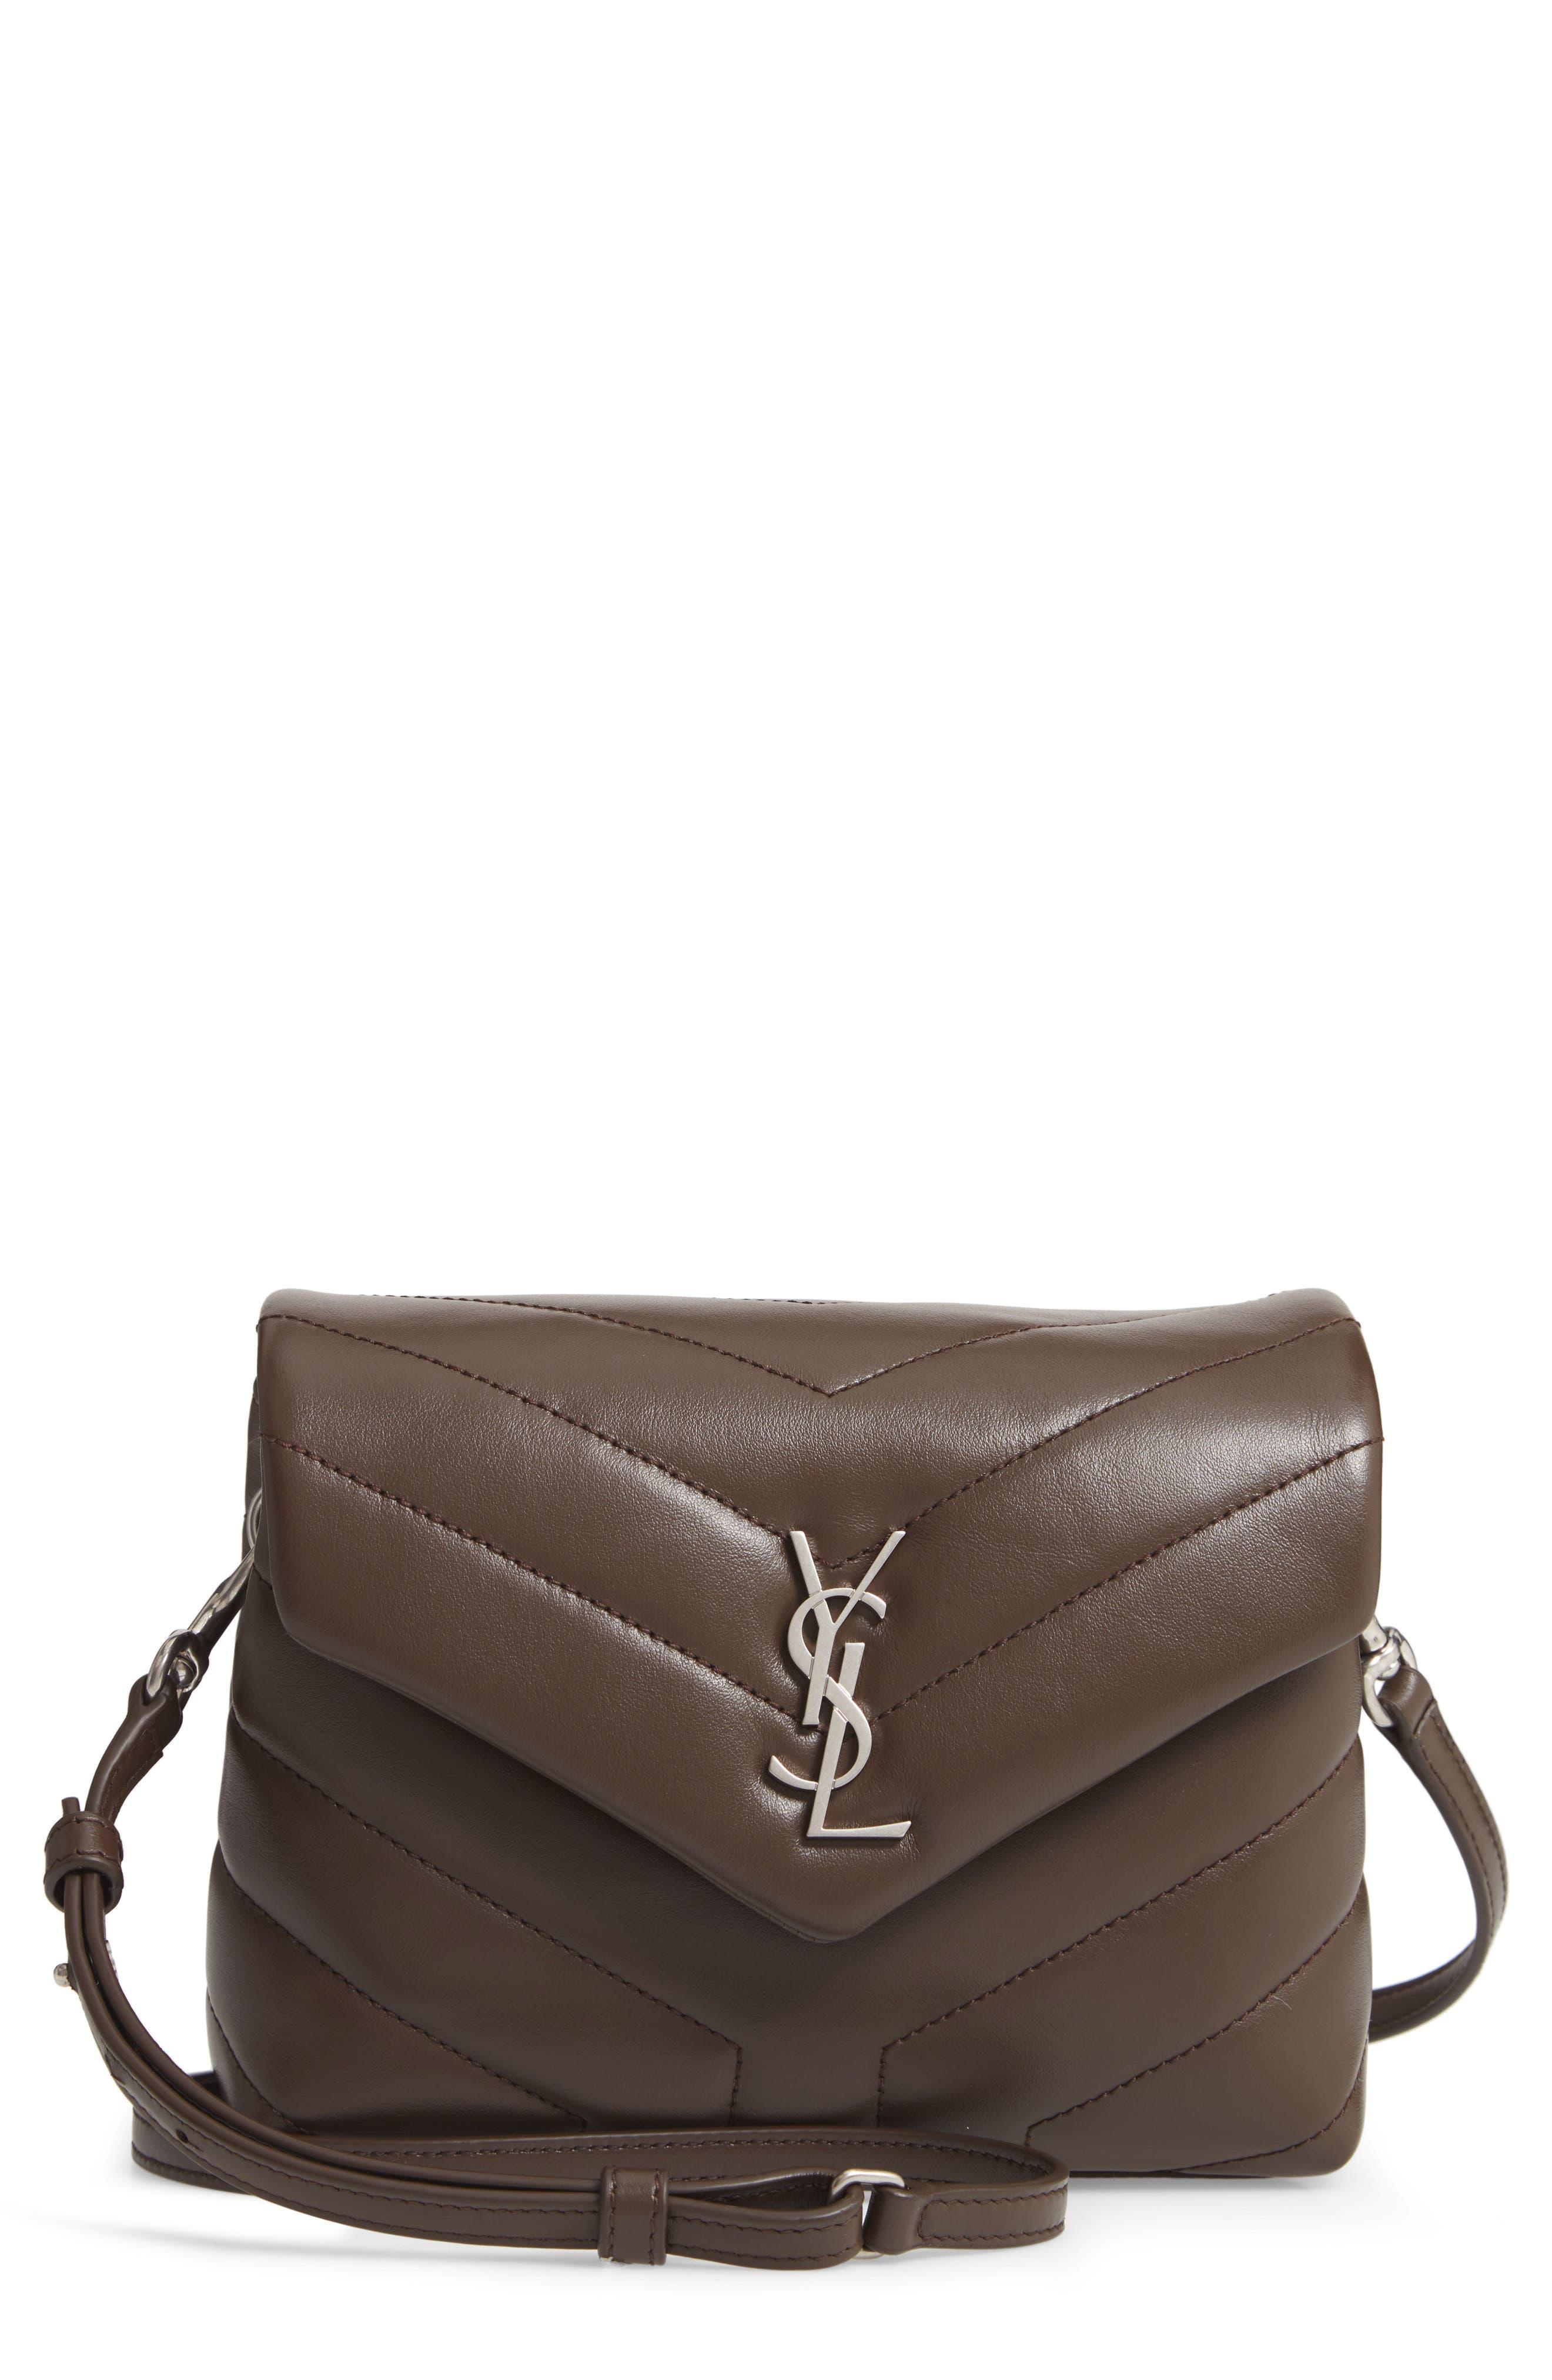 brown crossbody bags nordstrom rh shop nordstrom com